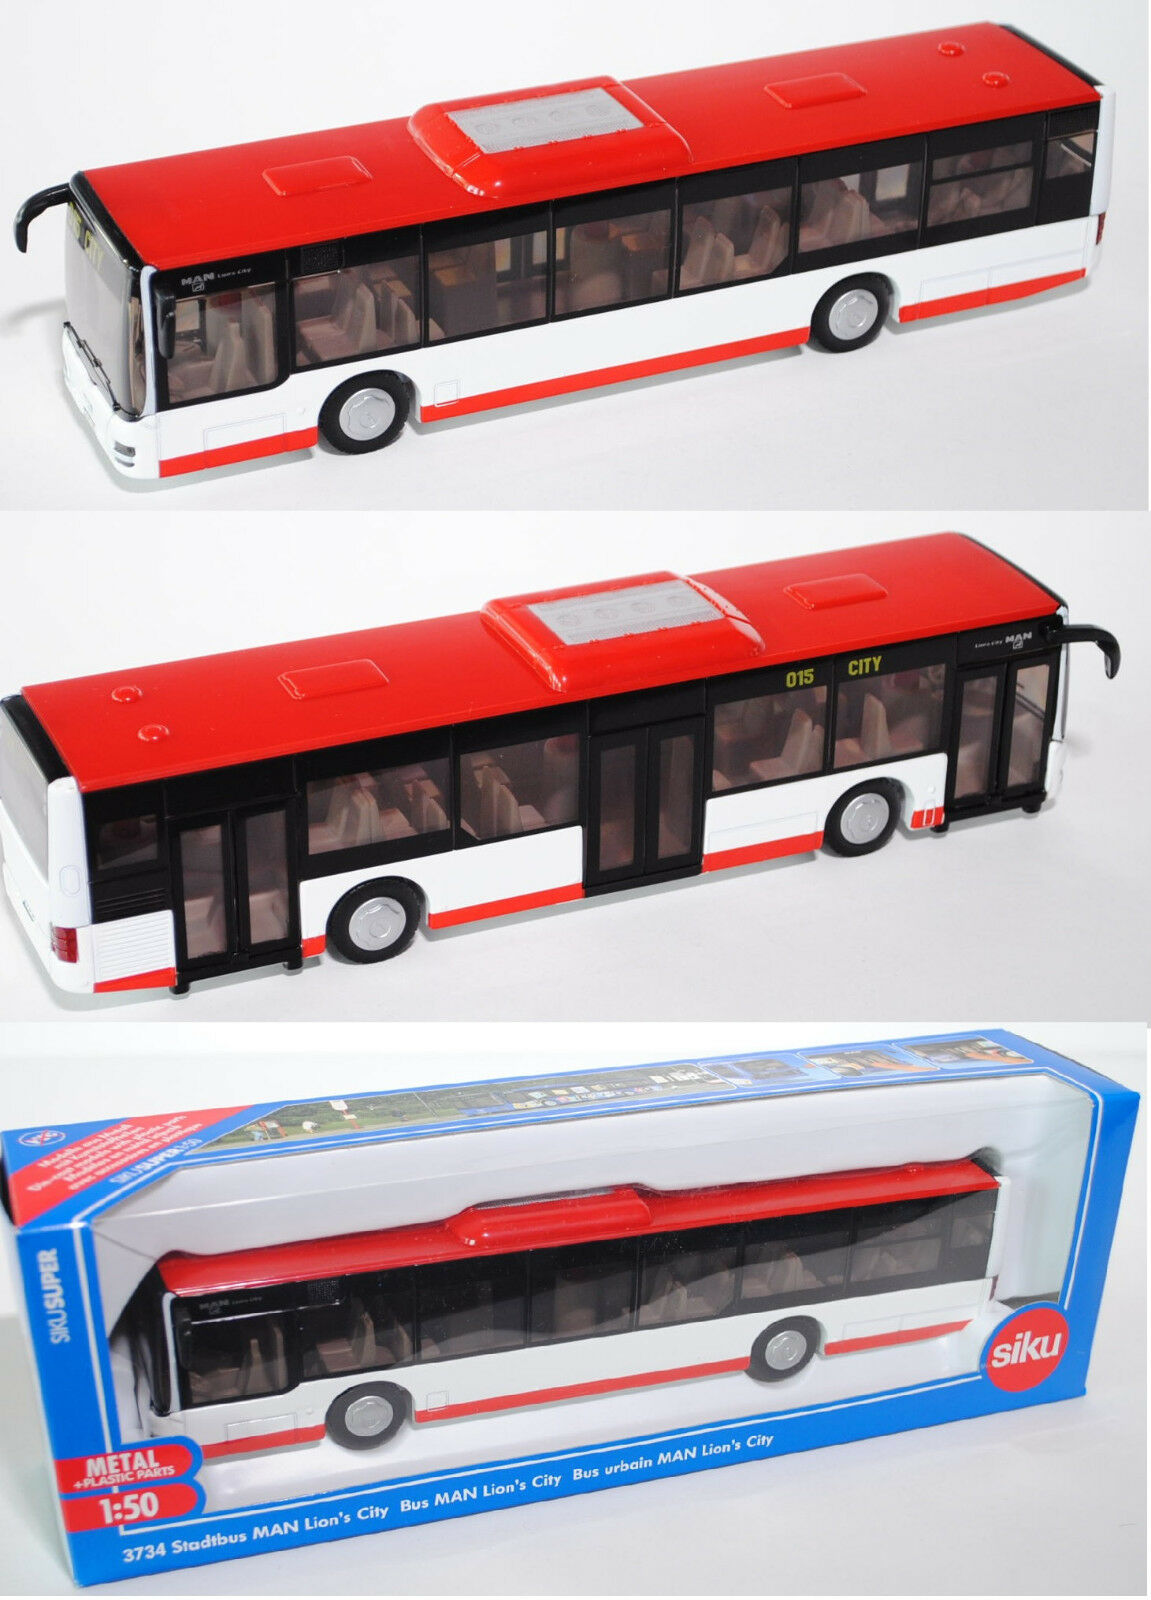 Siku Siku Siku Super 3734 Stadtbus MAN Lion's City Solobus red   white 1 50 4caff0